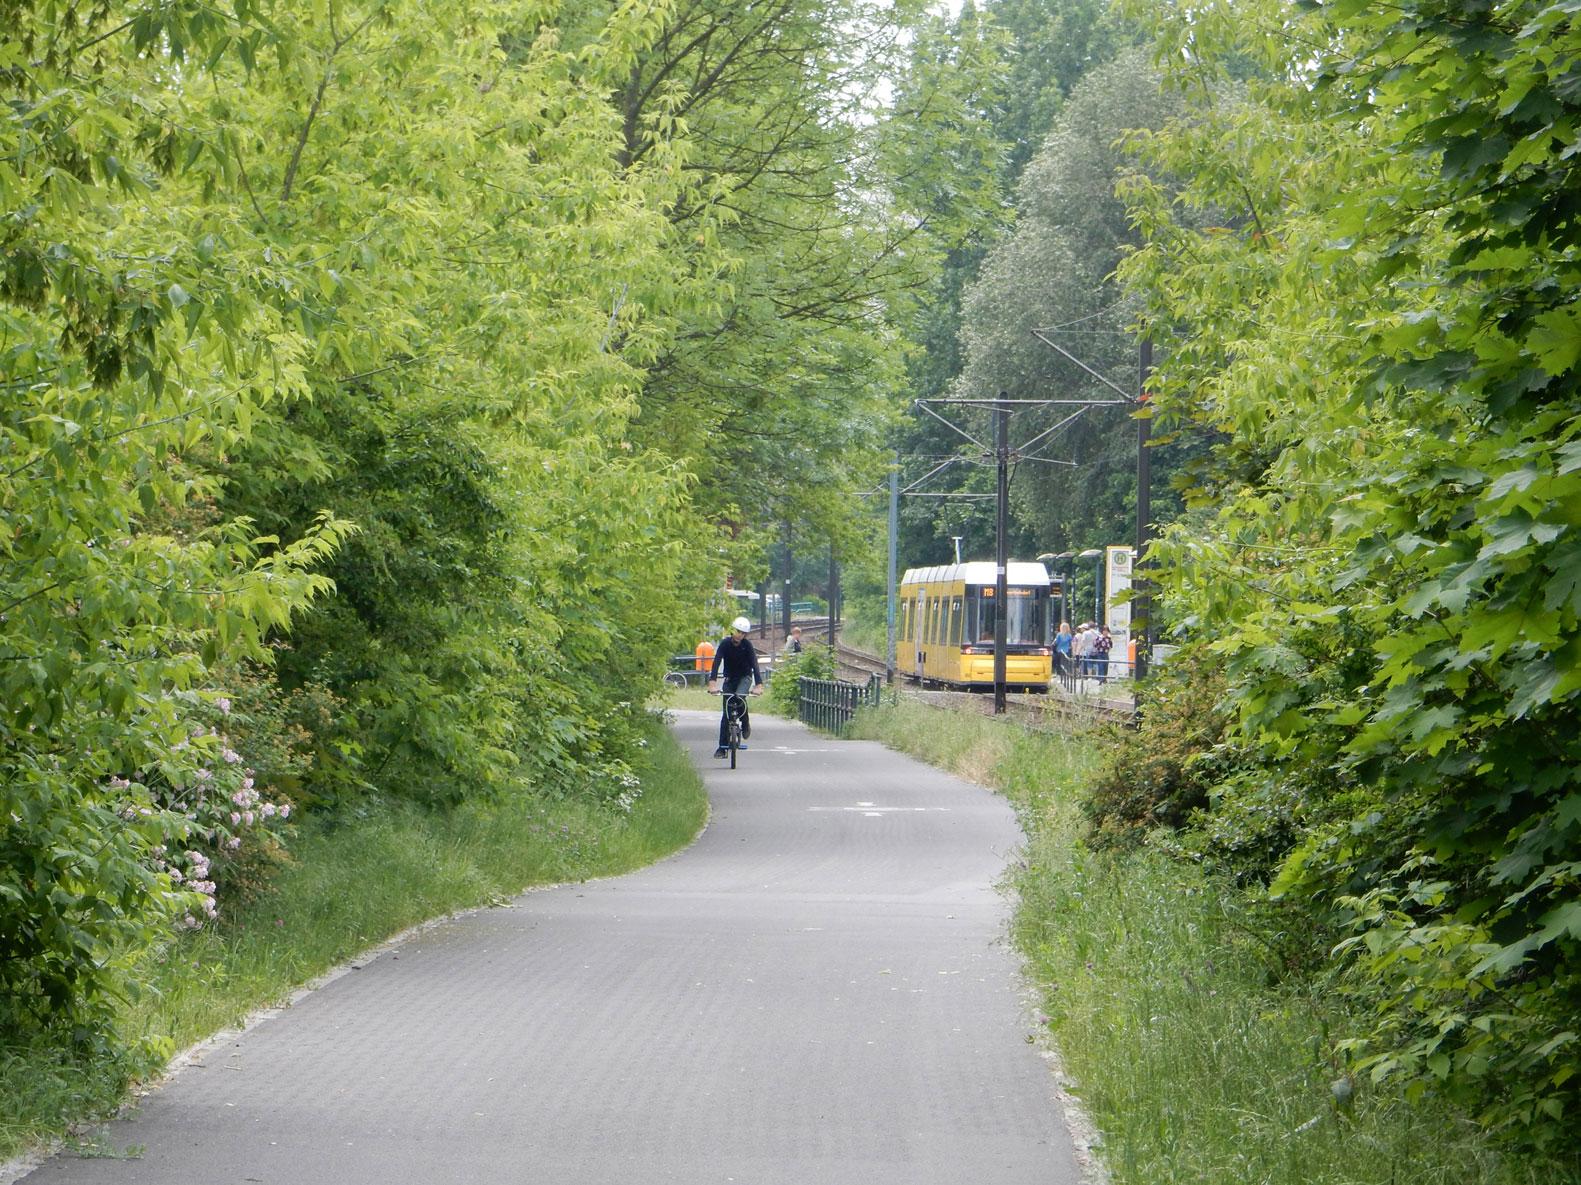 Radtour Berlin Marzahn